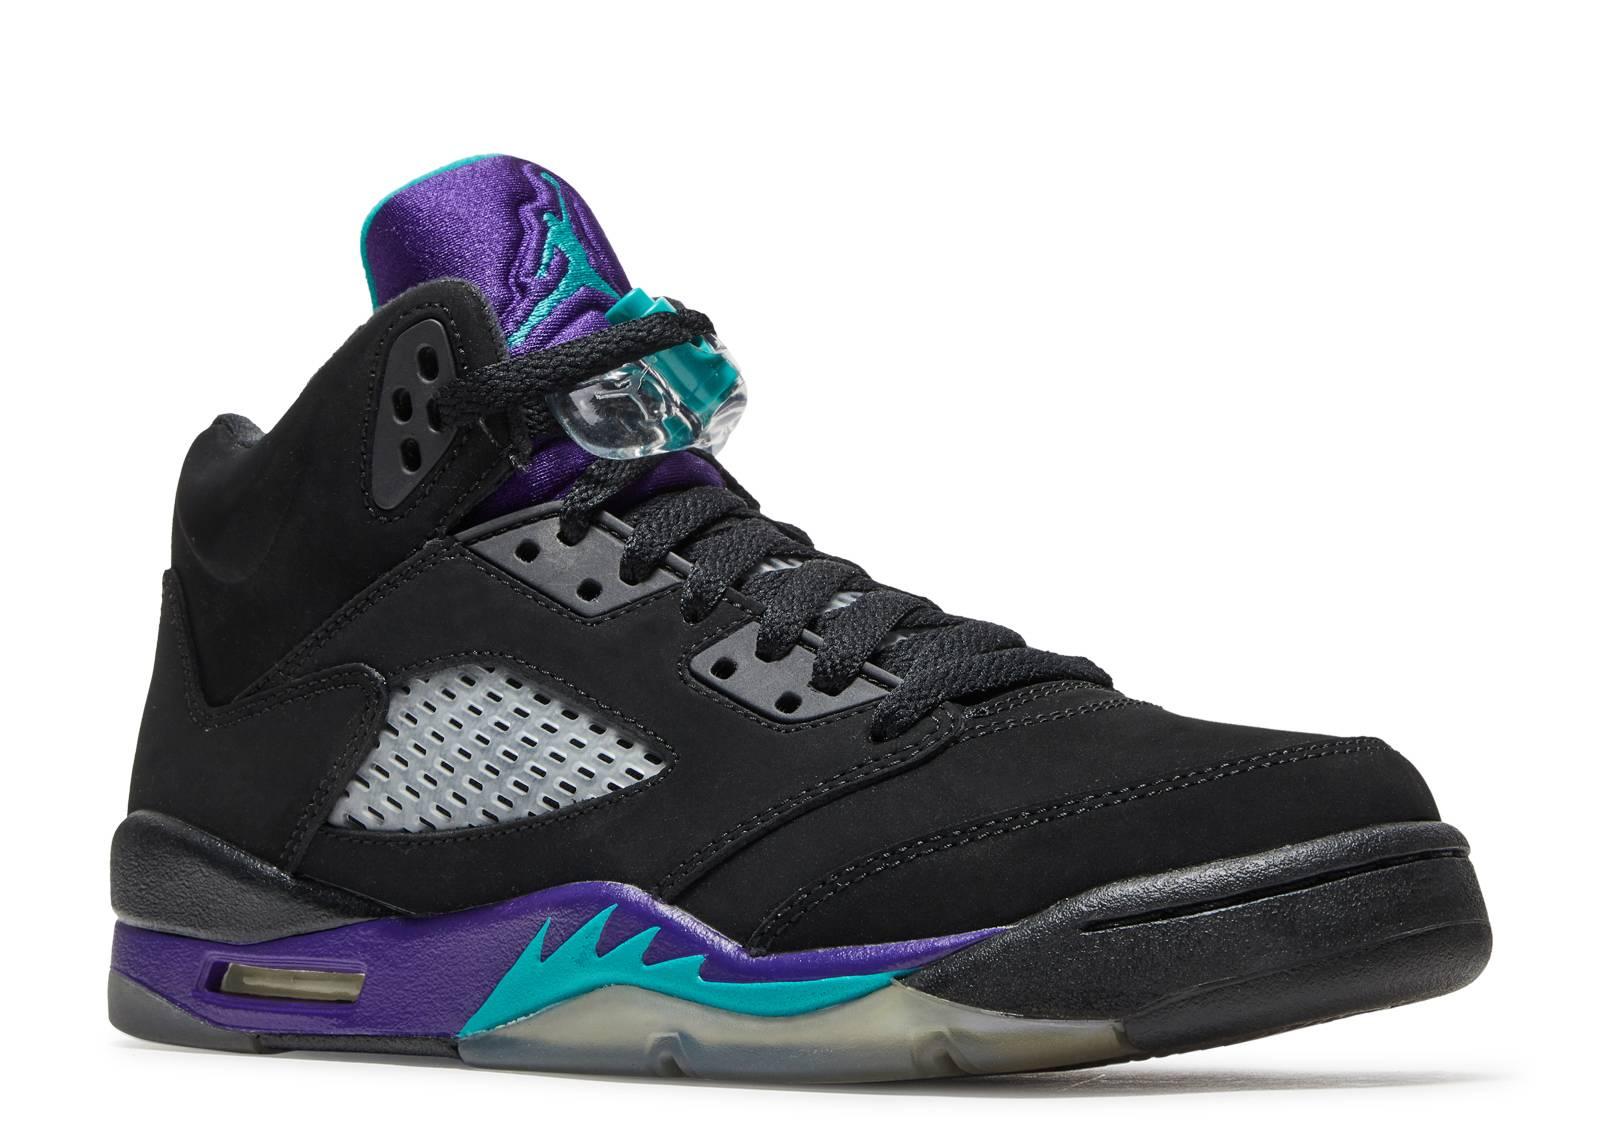 Nike Air Jordan 5 Retro Black Grape Trainer Size 6.5 UK